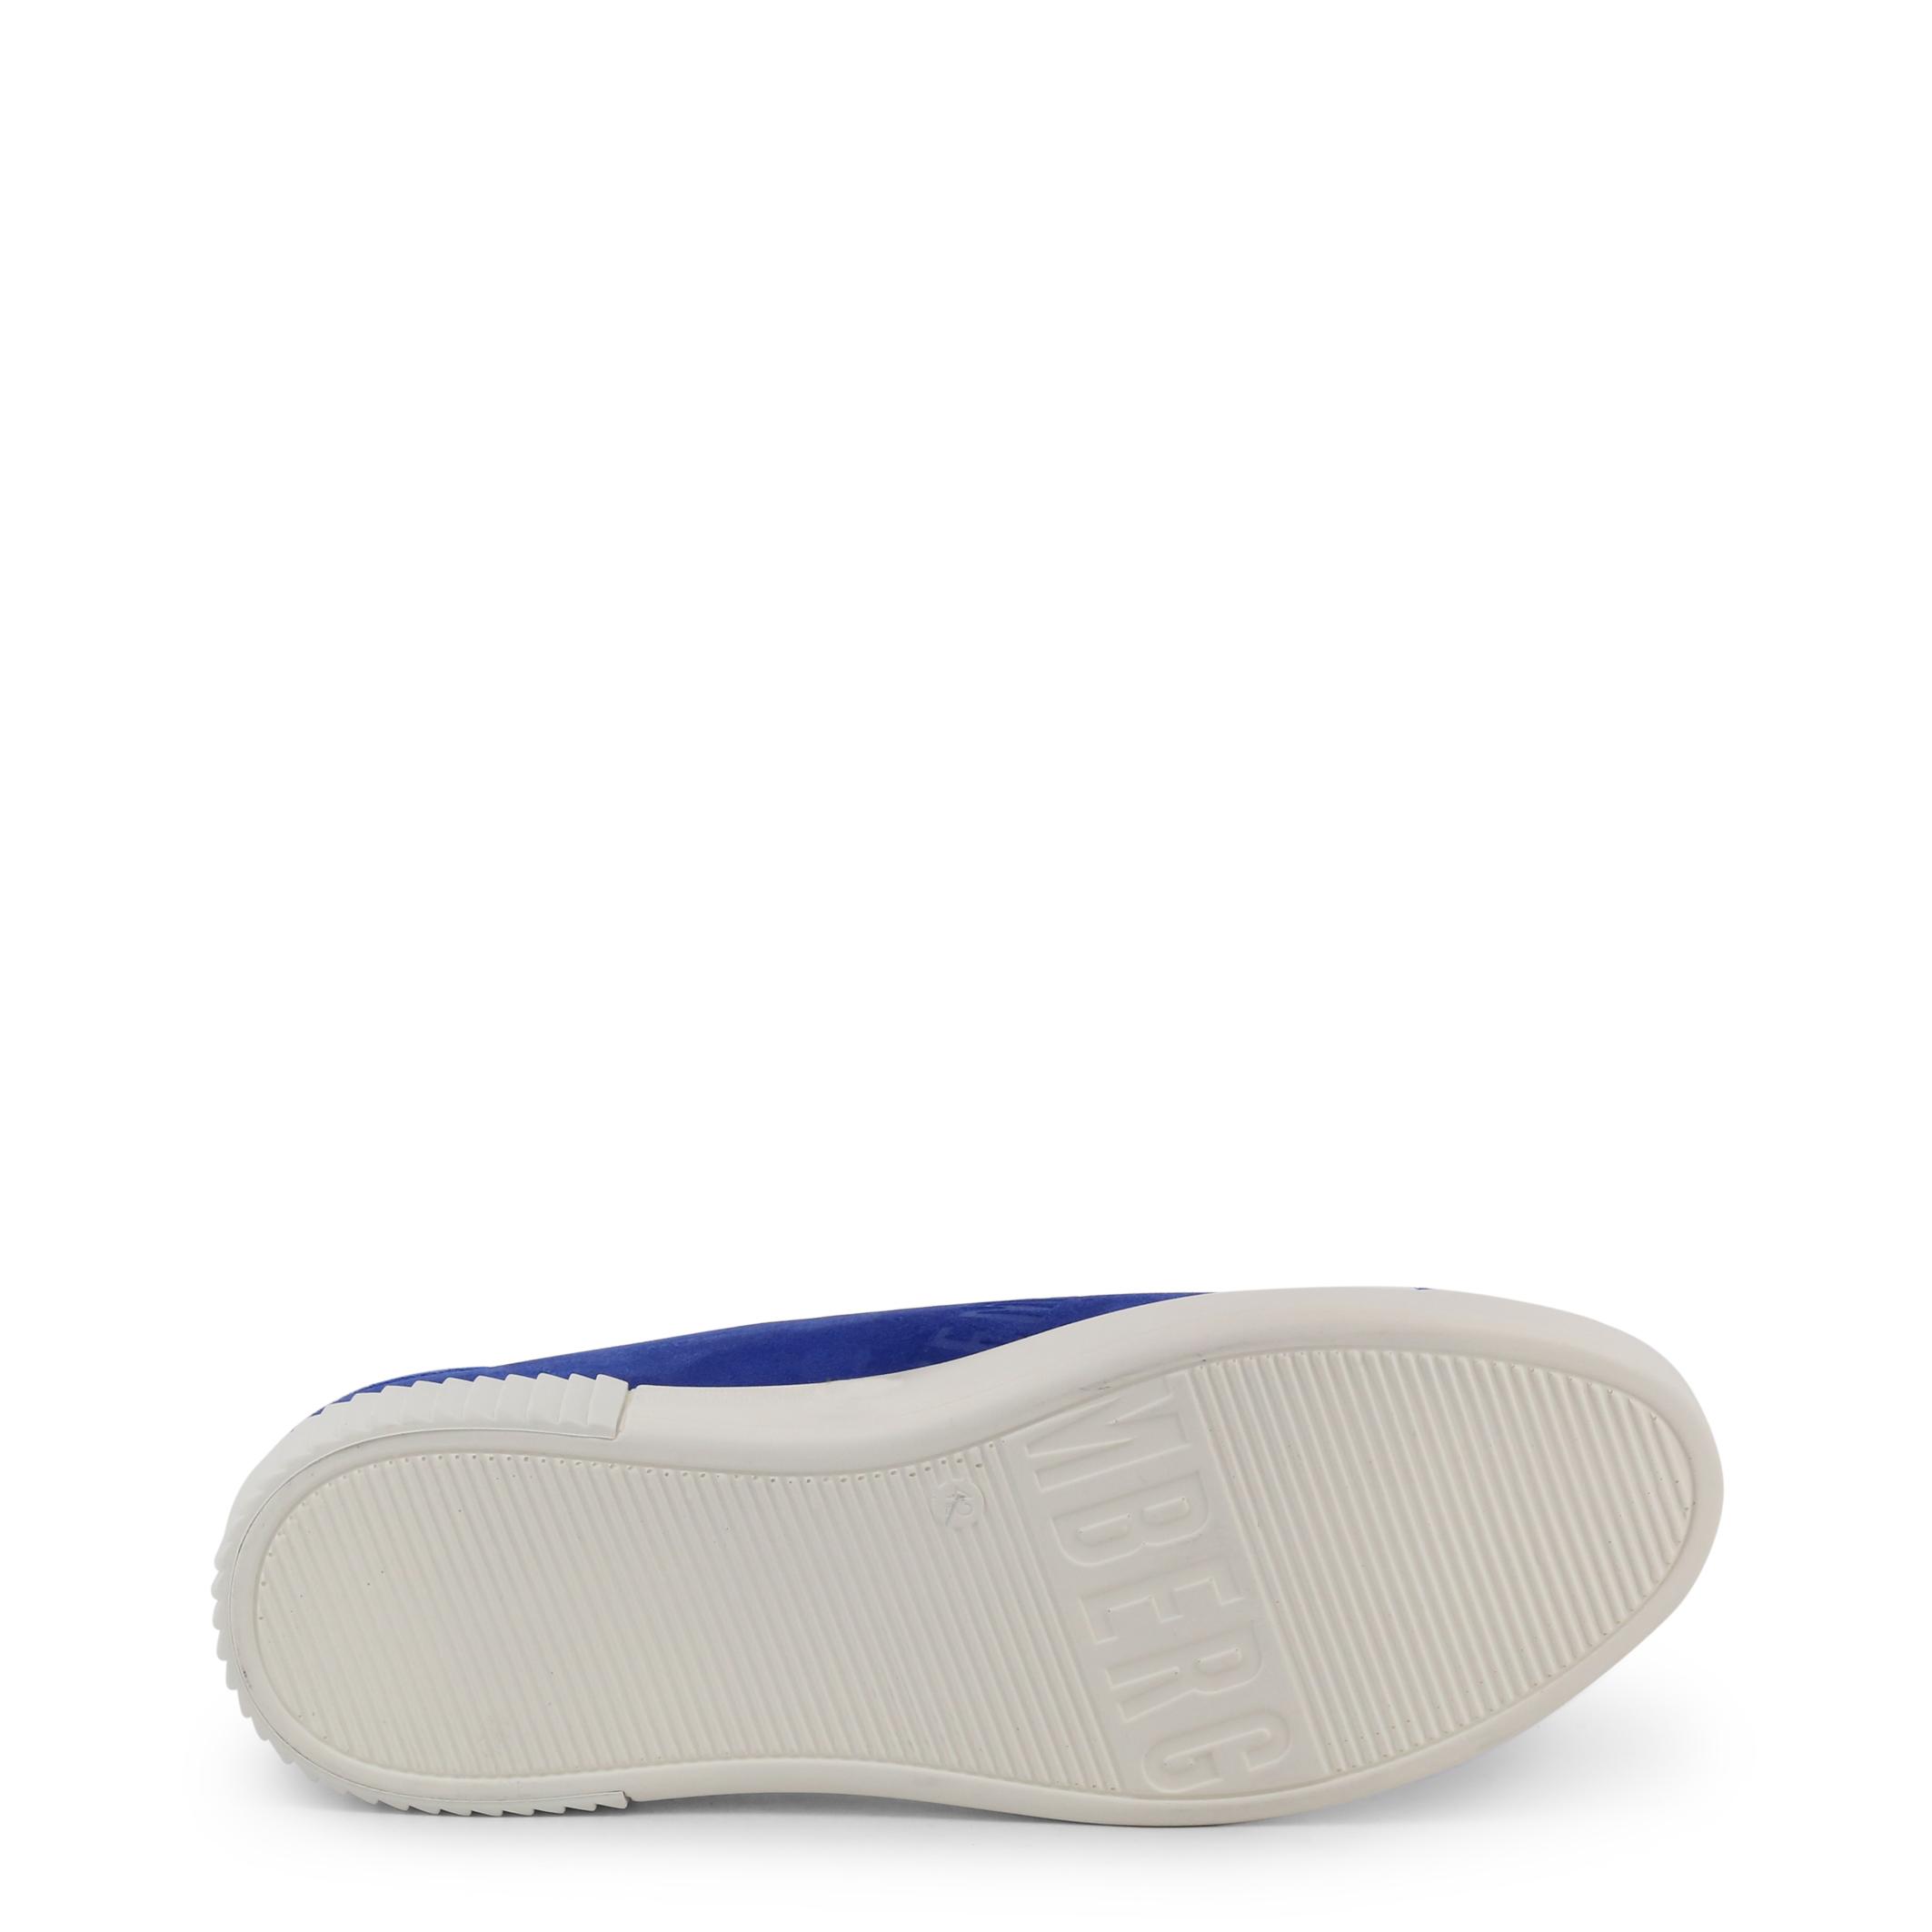 Chaussures de ville  Bikkembergs COSMOS_2100-SUEDE blue